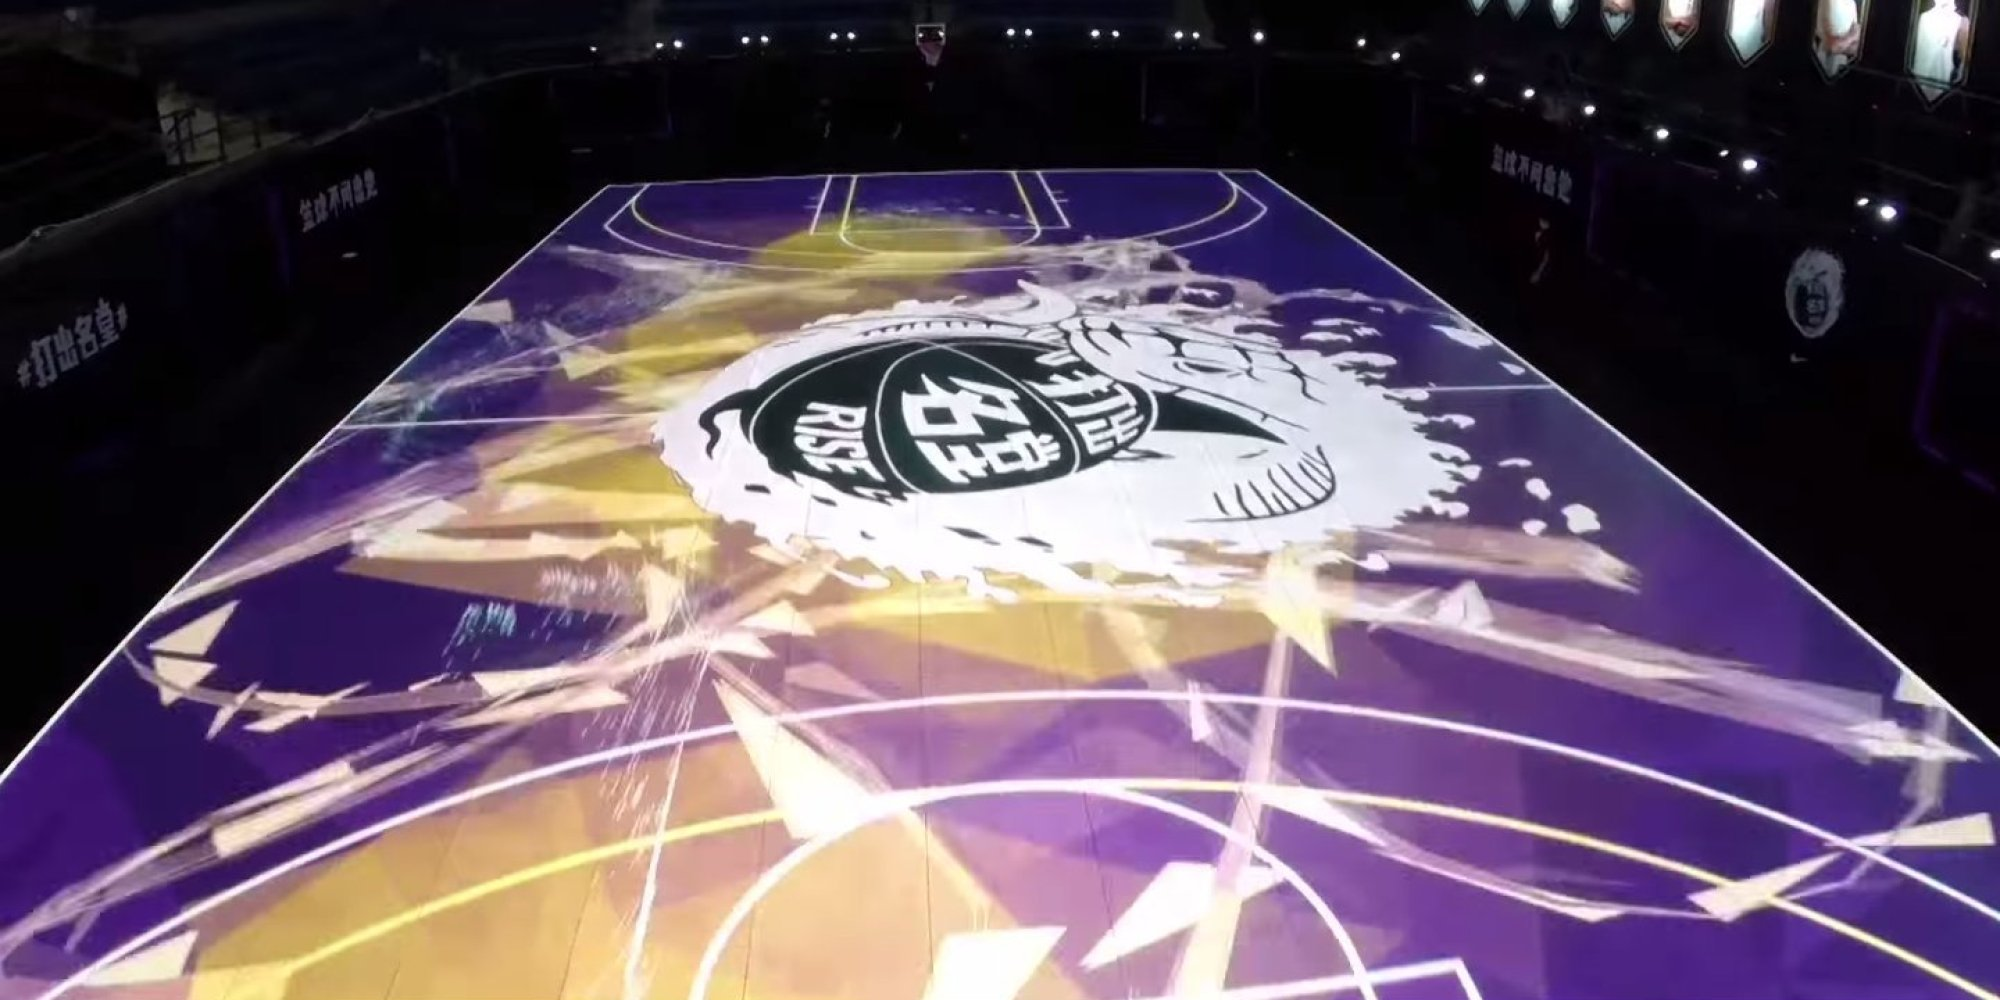 Nike 39 S Led Basketball Court Makes The Sport Look Like A